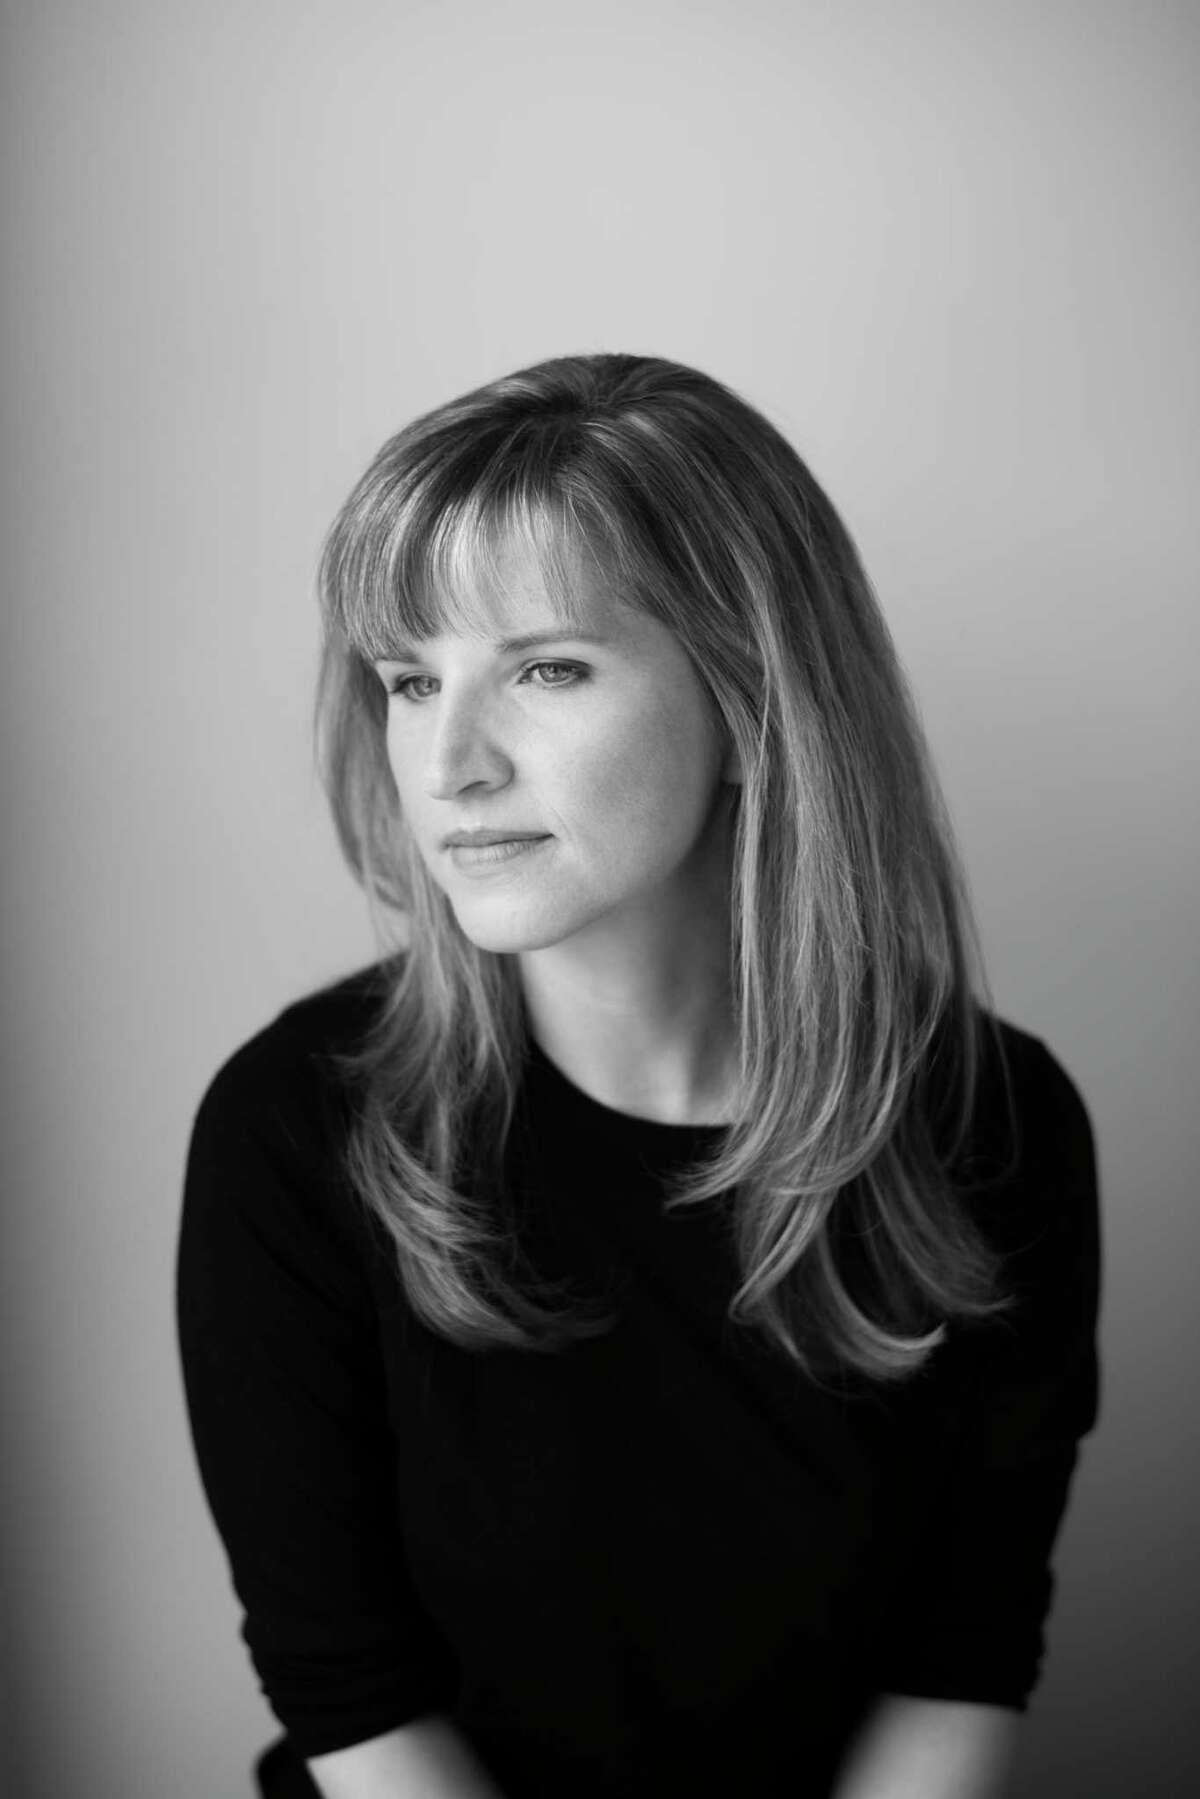 Author Tara Westover